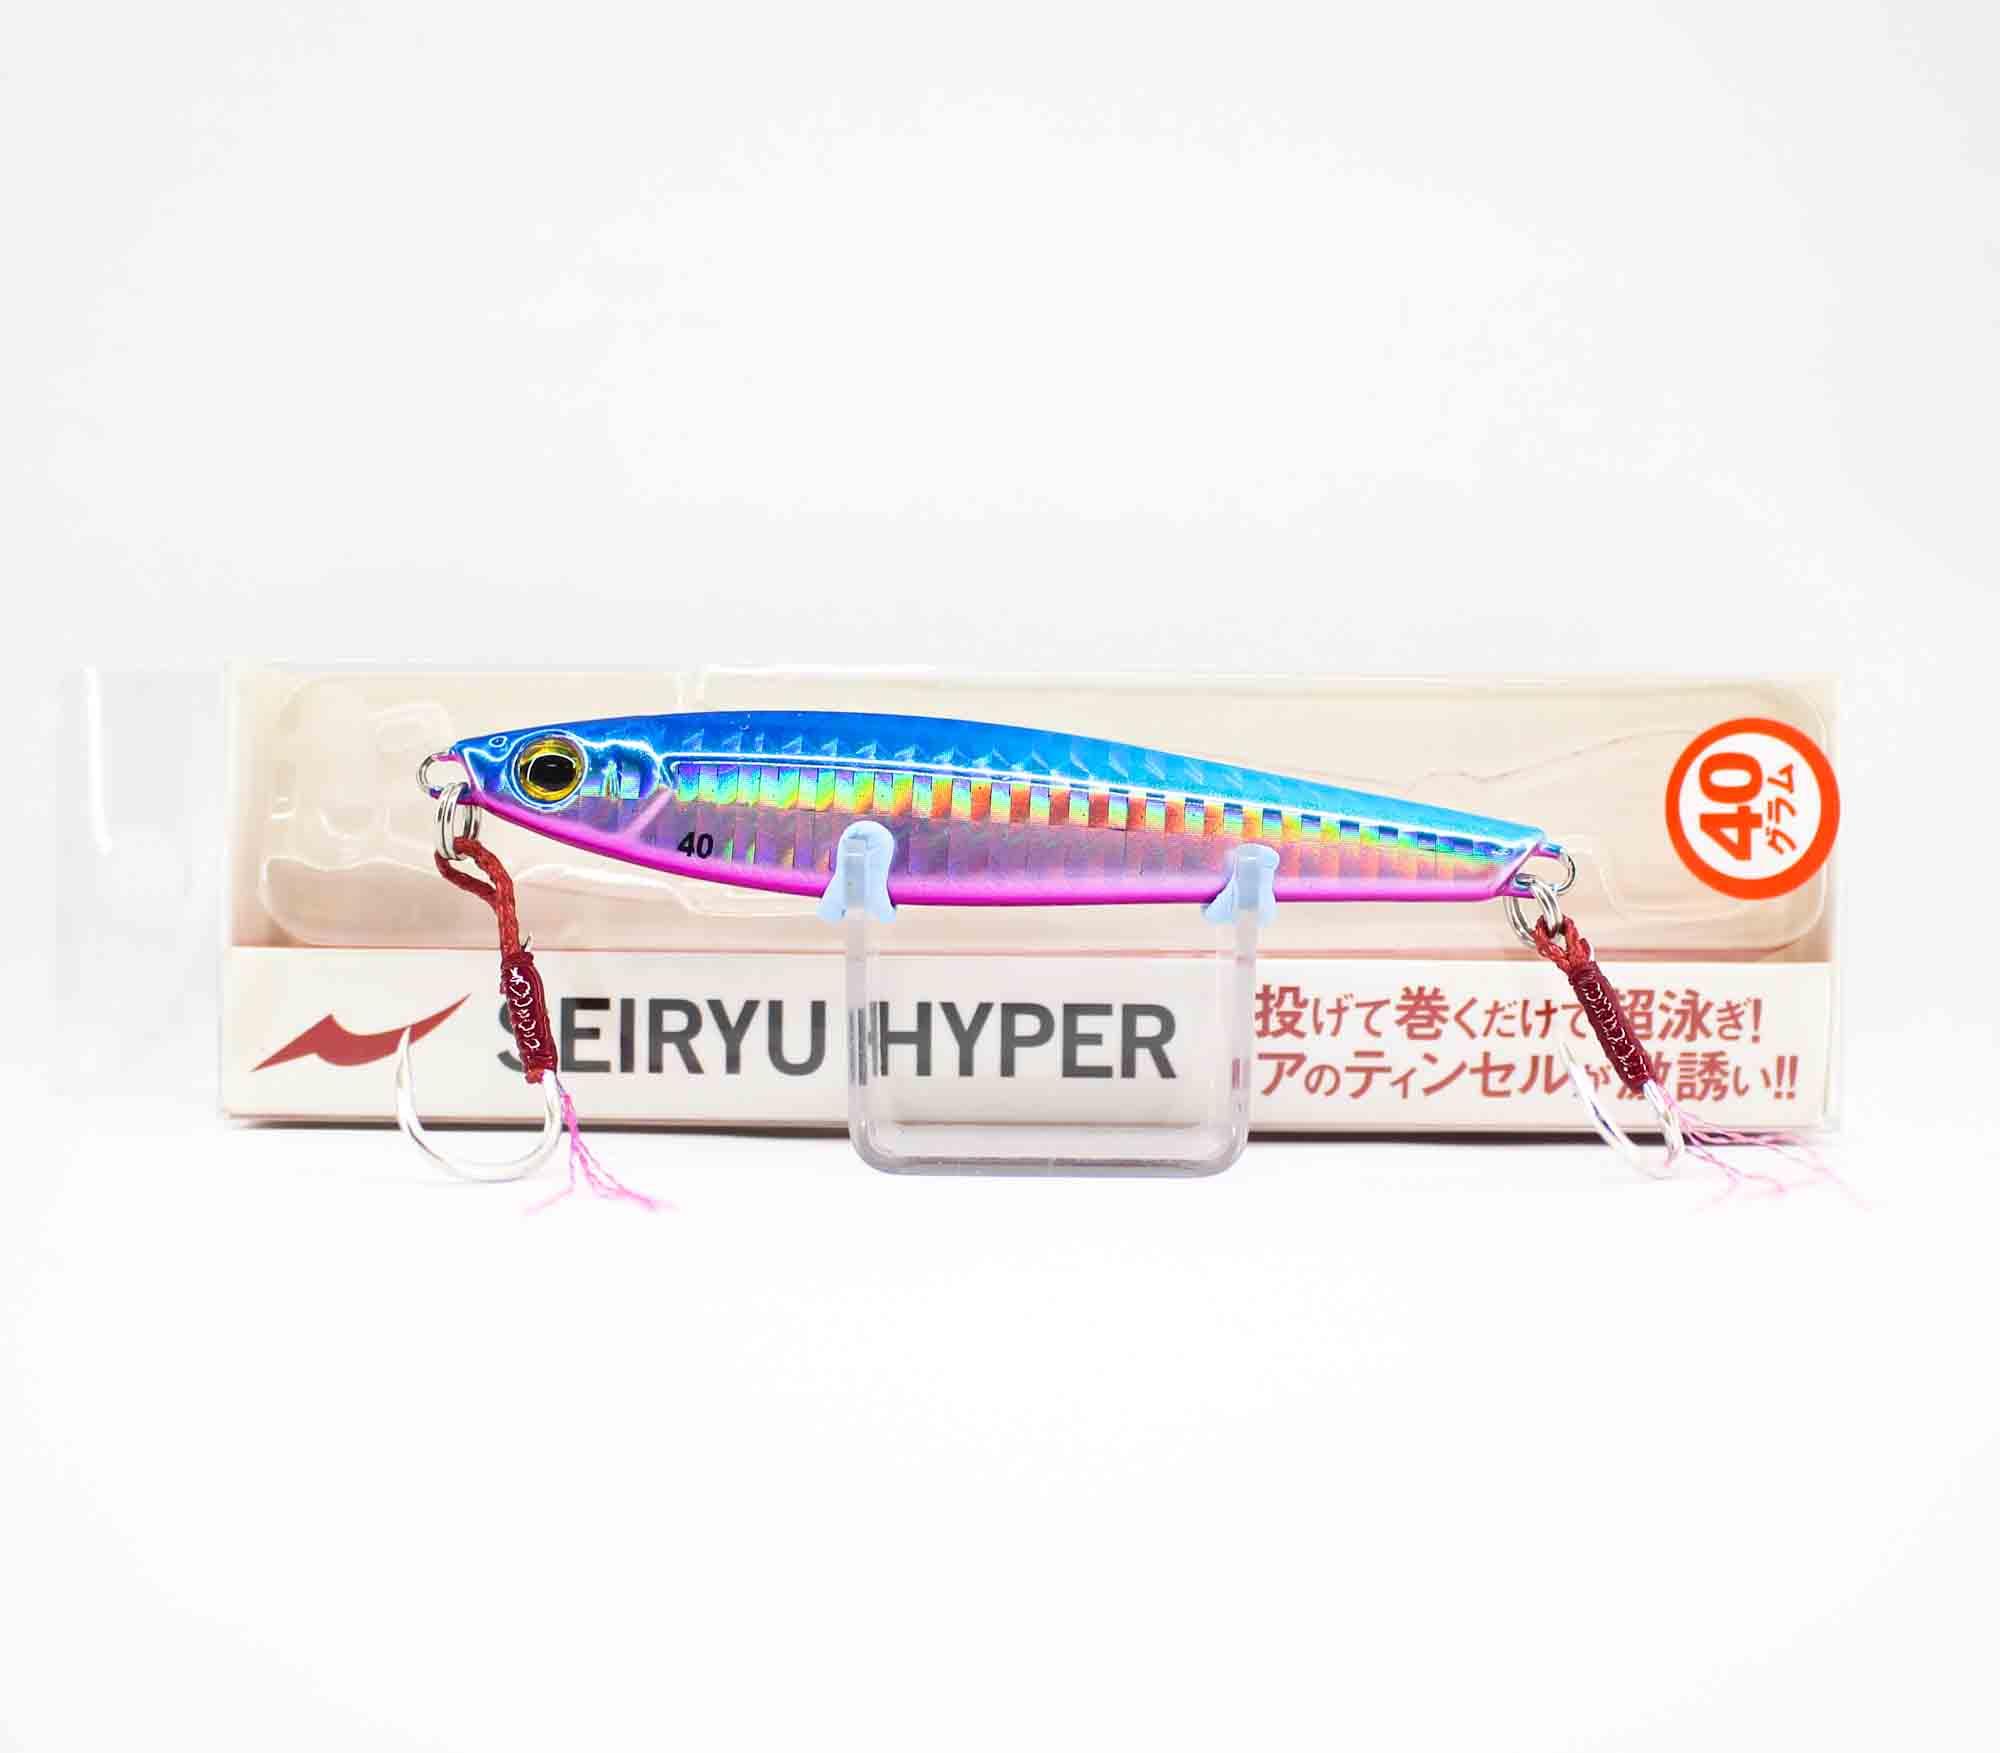 Apia Metal Jig Seiryu Hyper 40 Grams Sinking Lure 07 (2663)